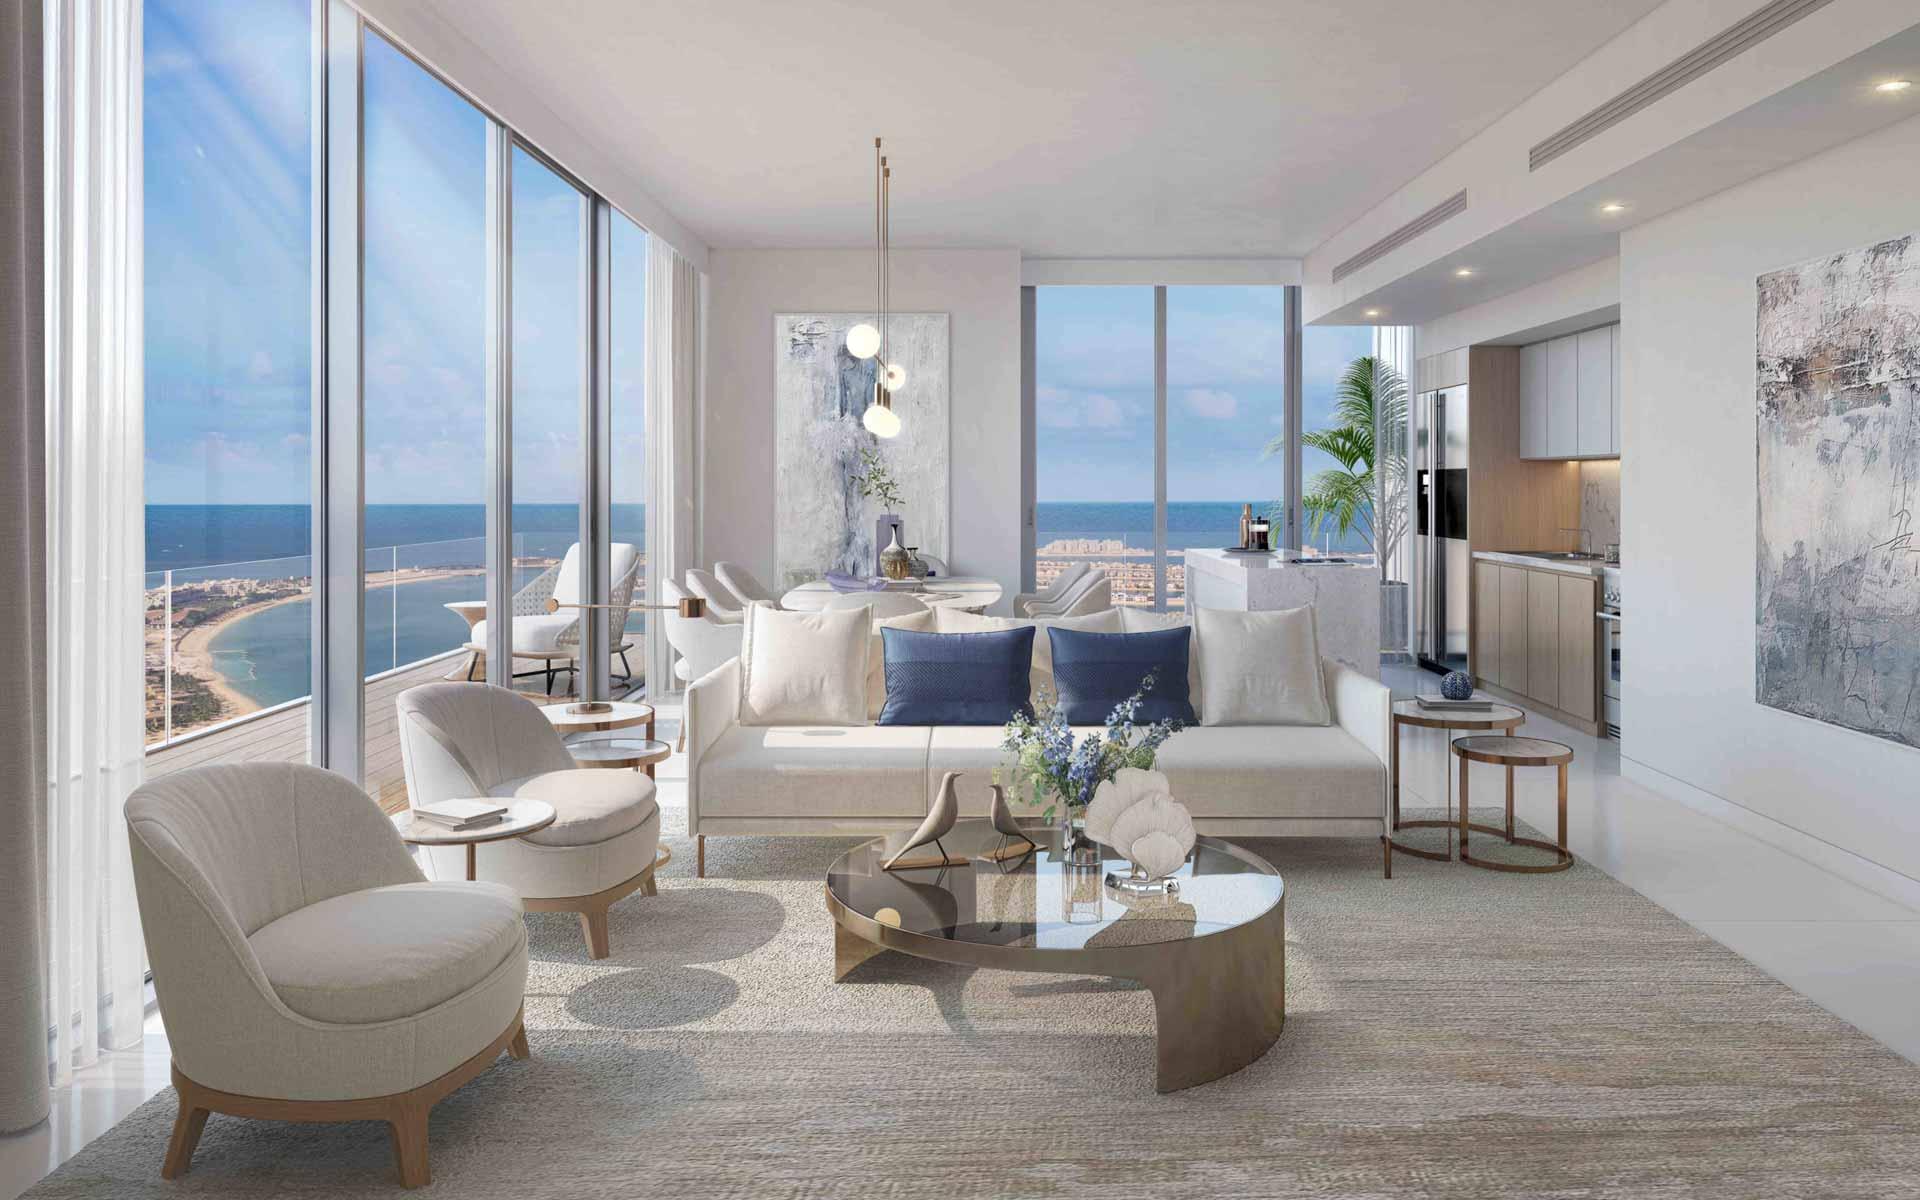 beautiful-2-bedroom-in-beach-isle